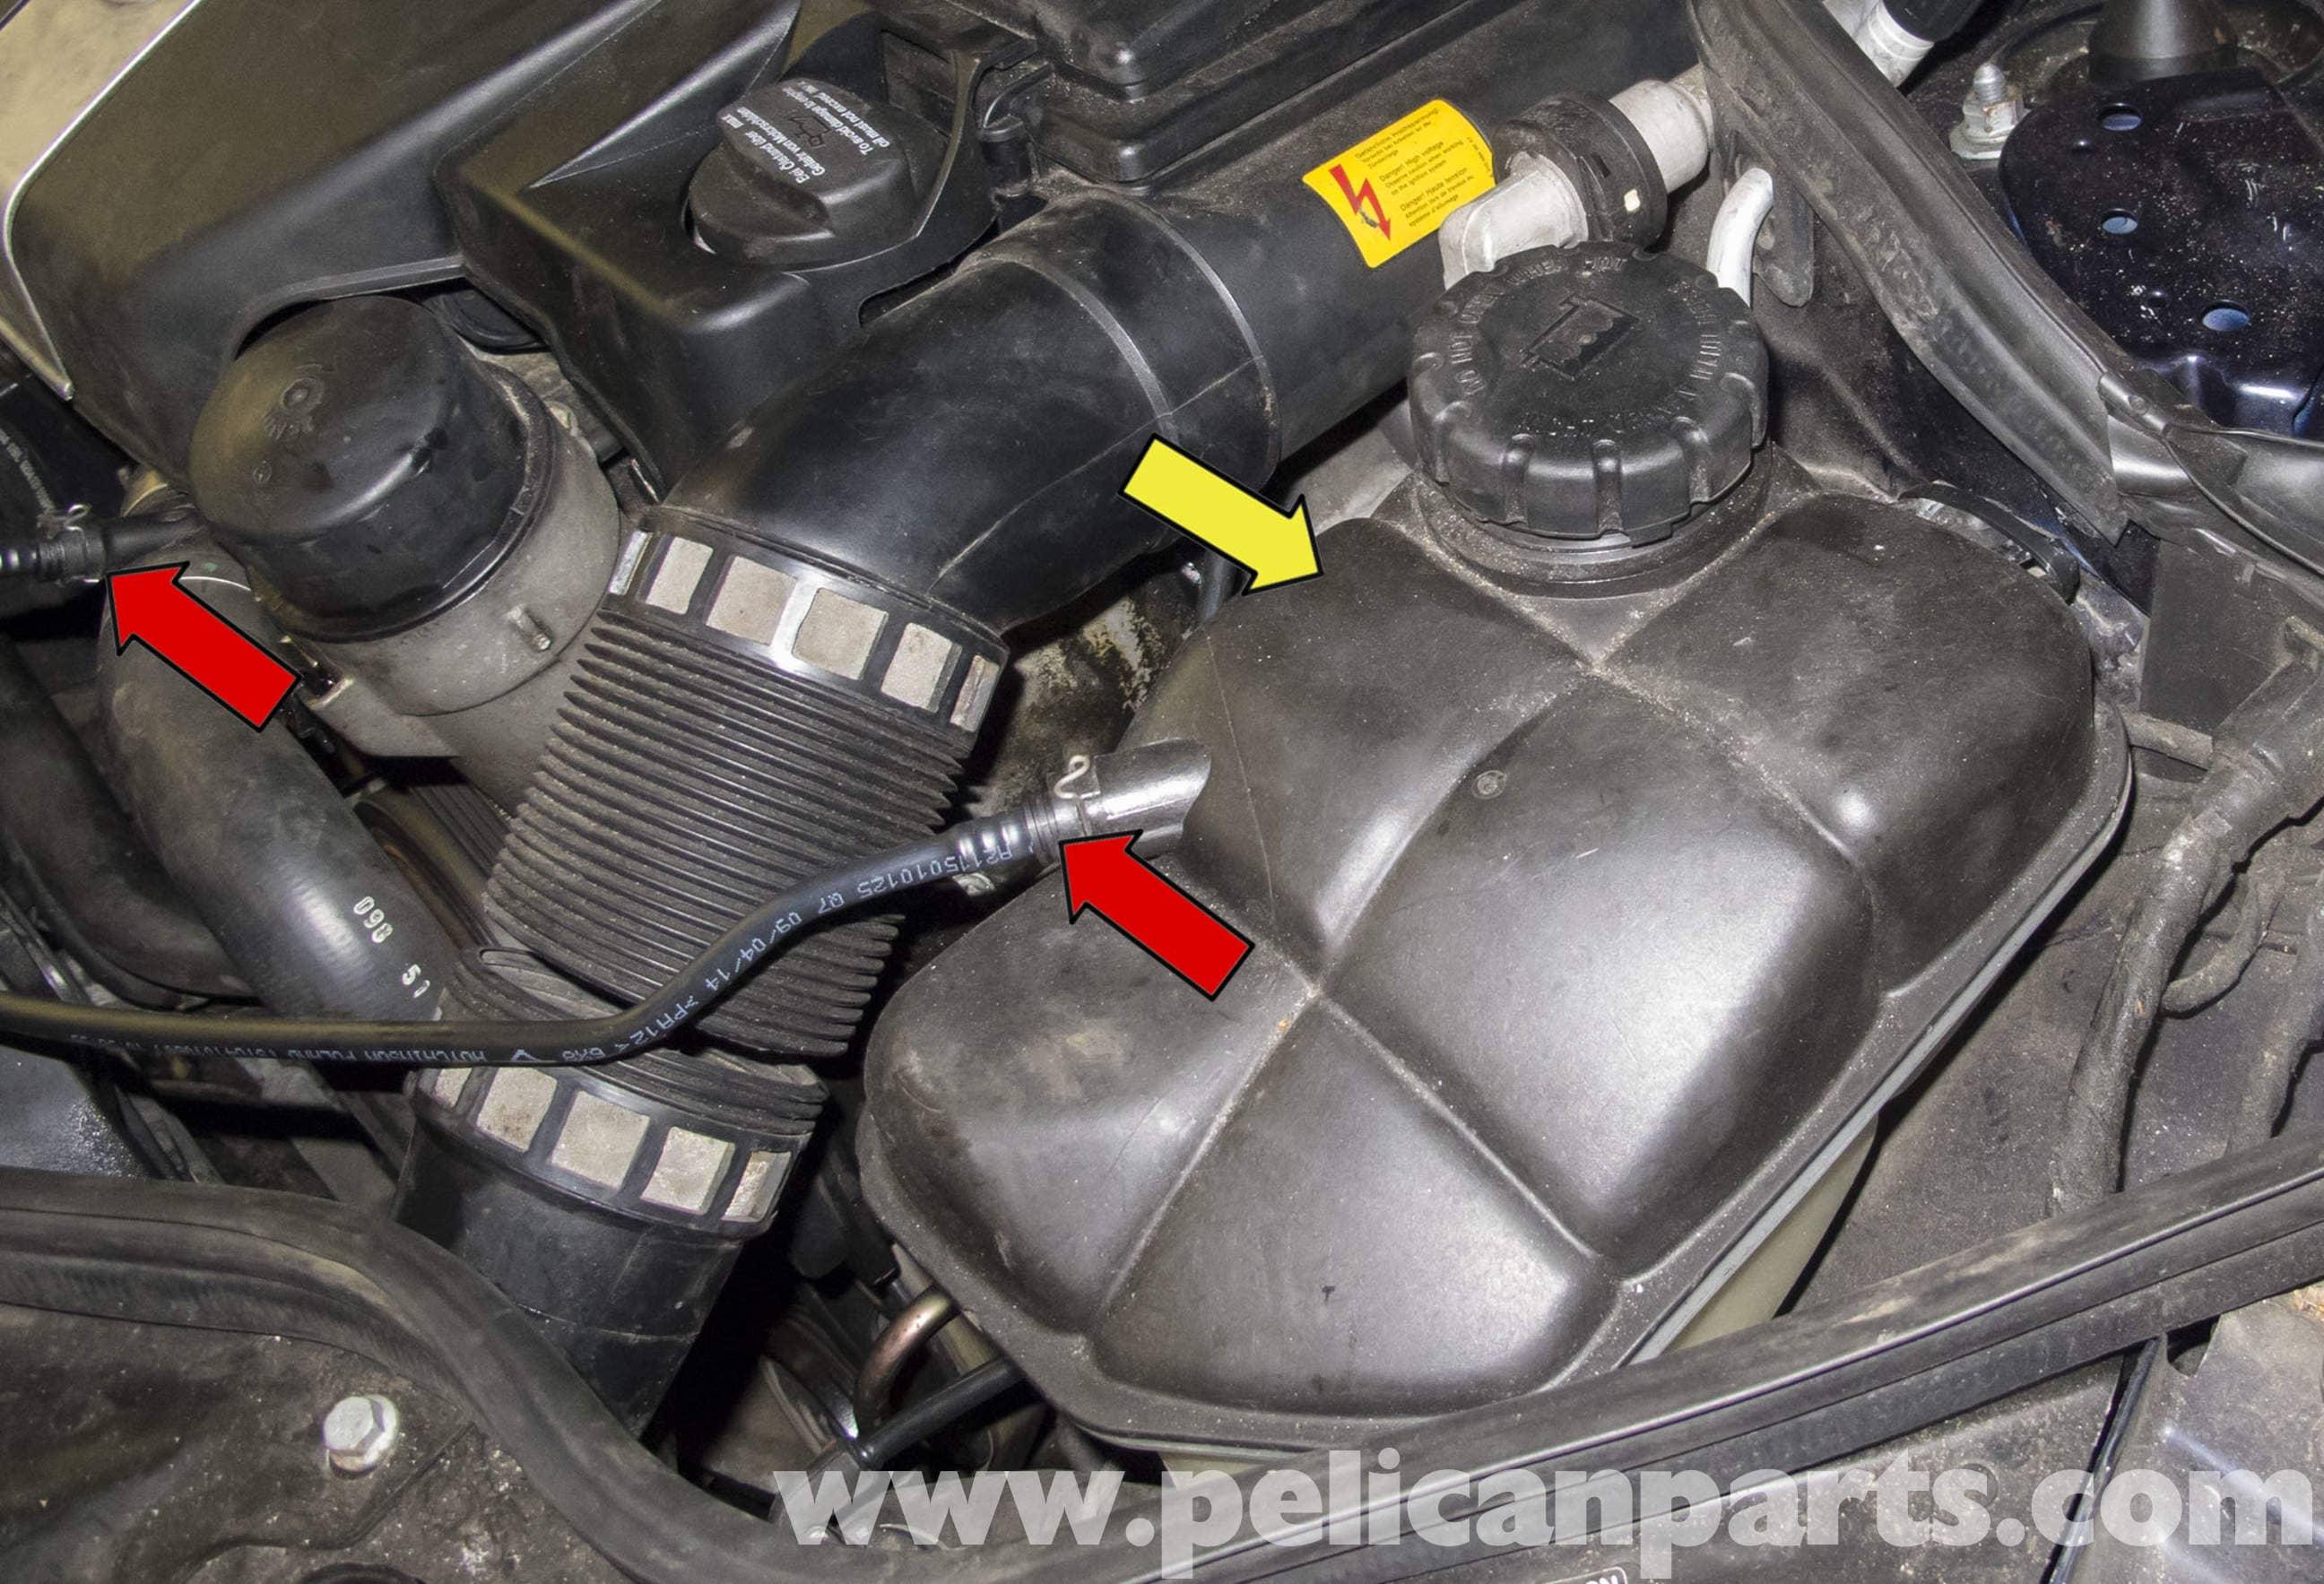 Mercedes Benz W211 Cooling System Leak Test 2003 2009 E320 E500